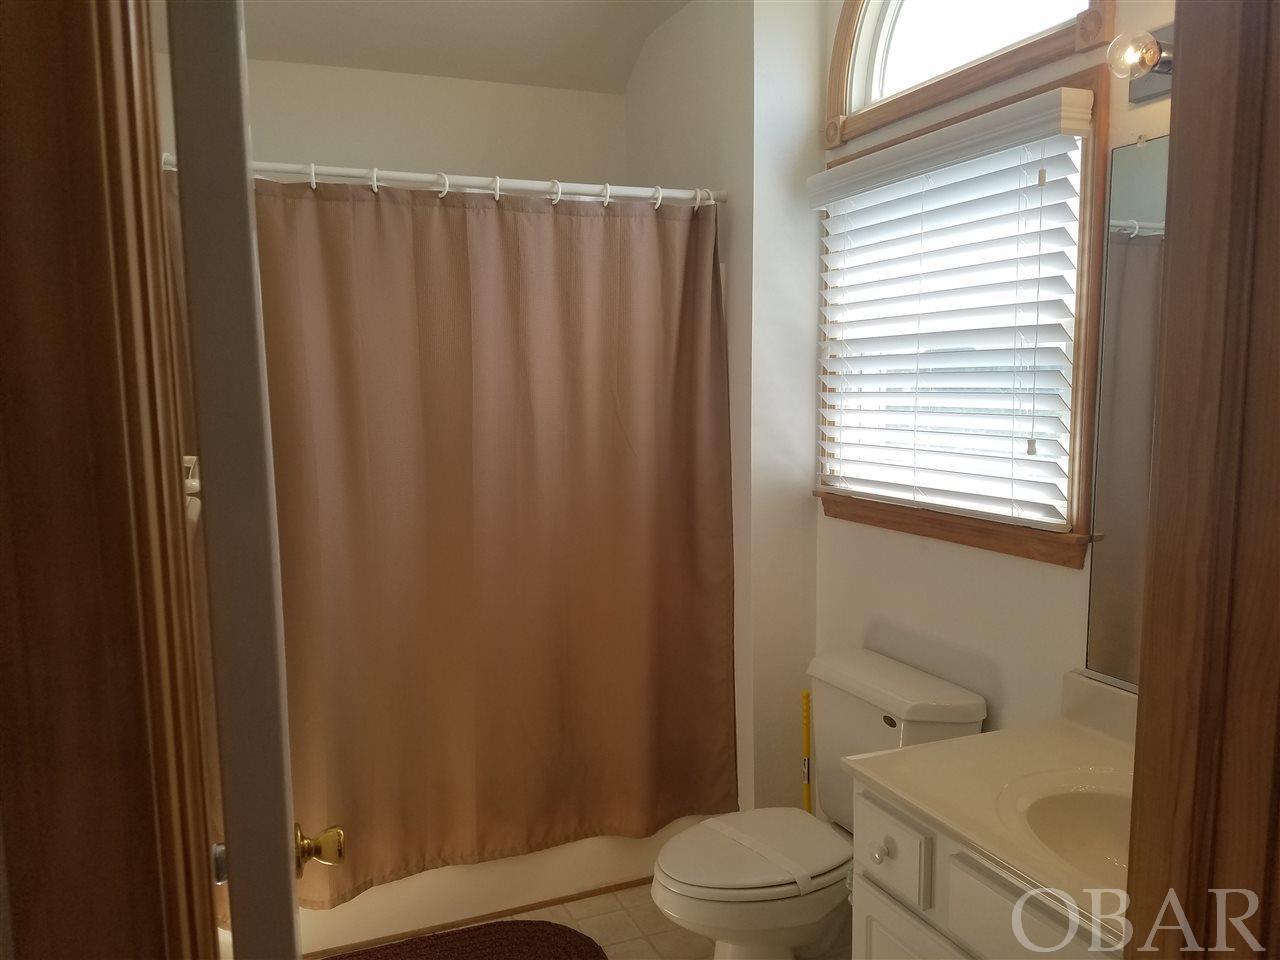 42026 Pheasant Circle,Avon,NC 27915,4 Bedrooms Bedrooms,3 BathroomsBathrooms,Residential,Pheasant Circle,96479